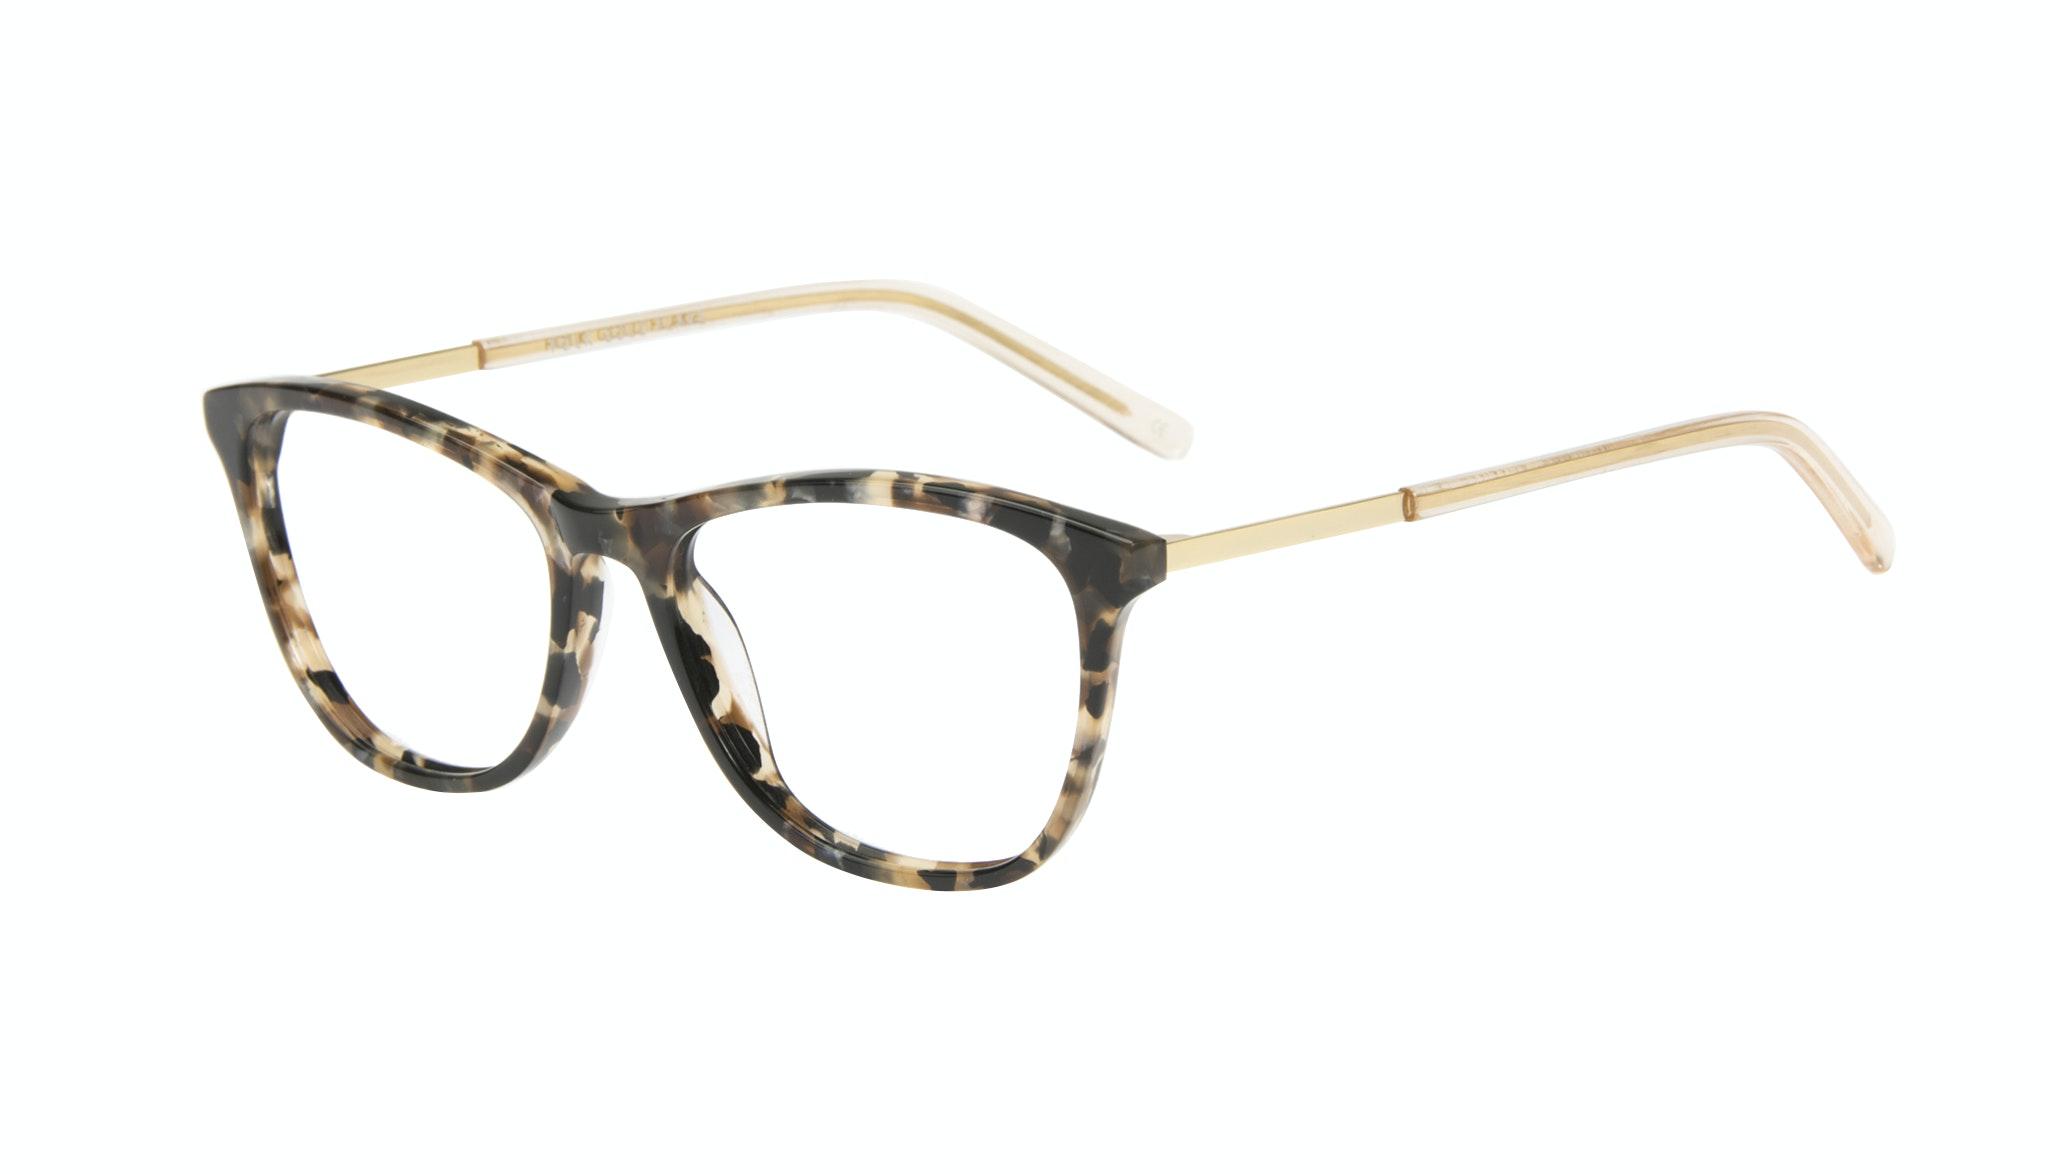 Affordable Fashion Glasses Rectangle Eyeglasses Women Folk Gold Flake Tilt